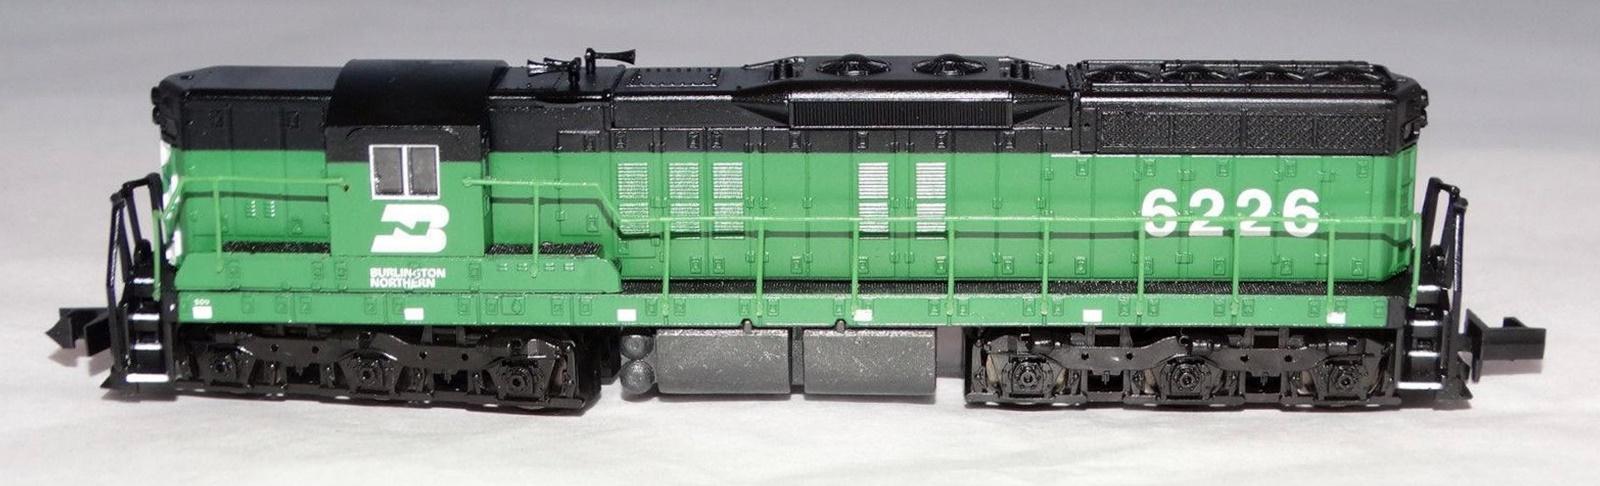 N Scale - Life-Like - 7739 - Locomotive, Diesel, EMD SD7 - Burlington Northern - 6226